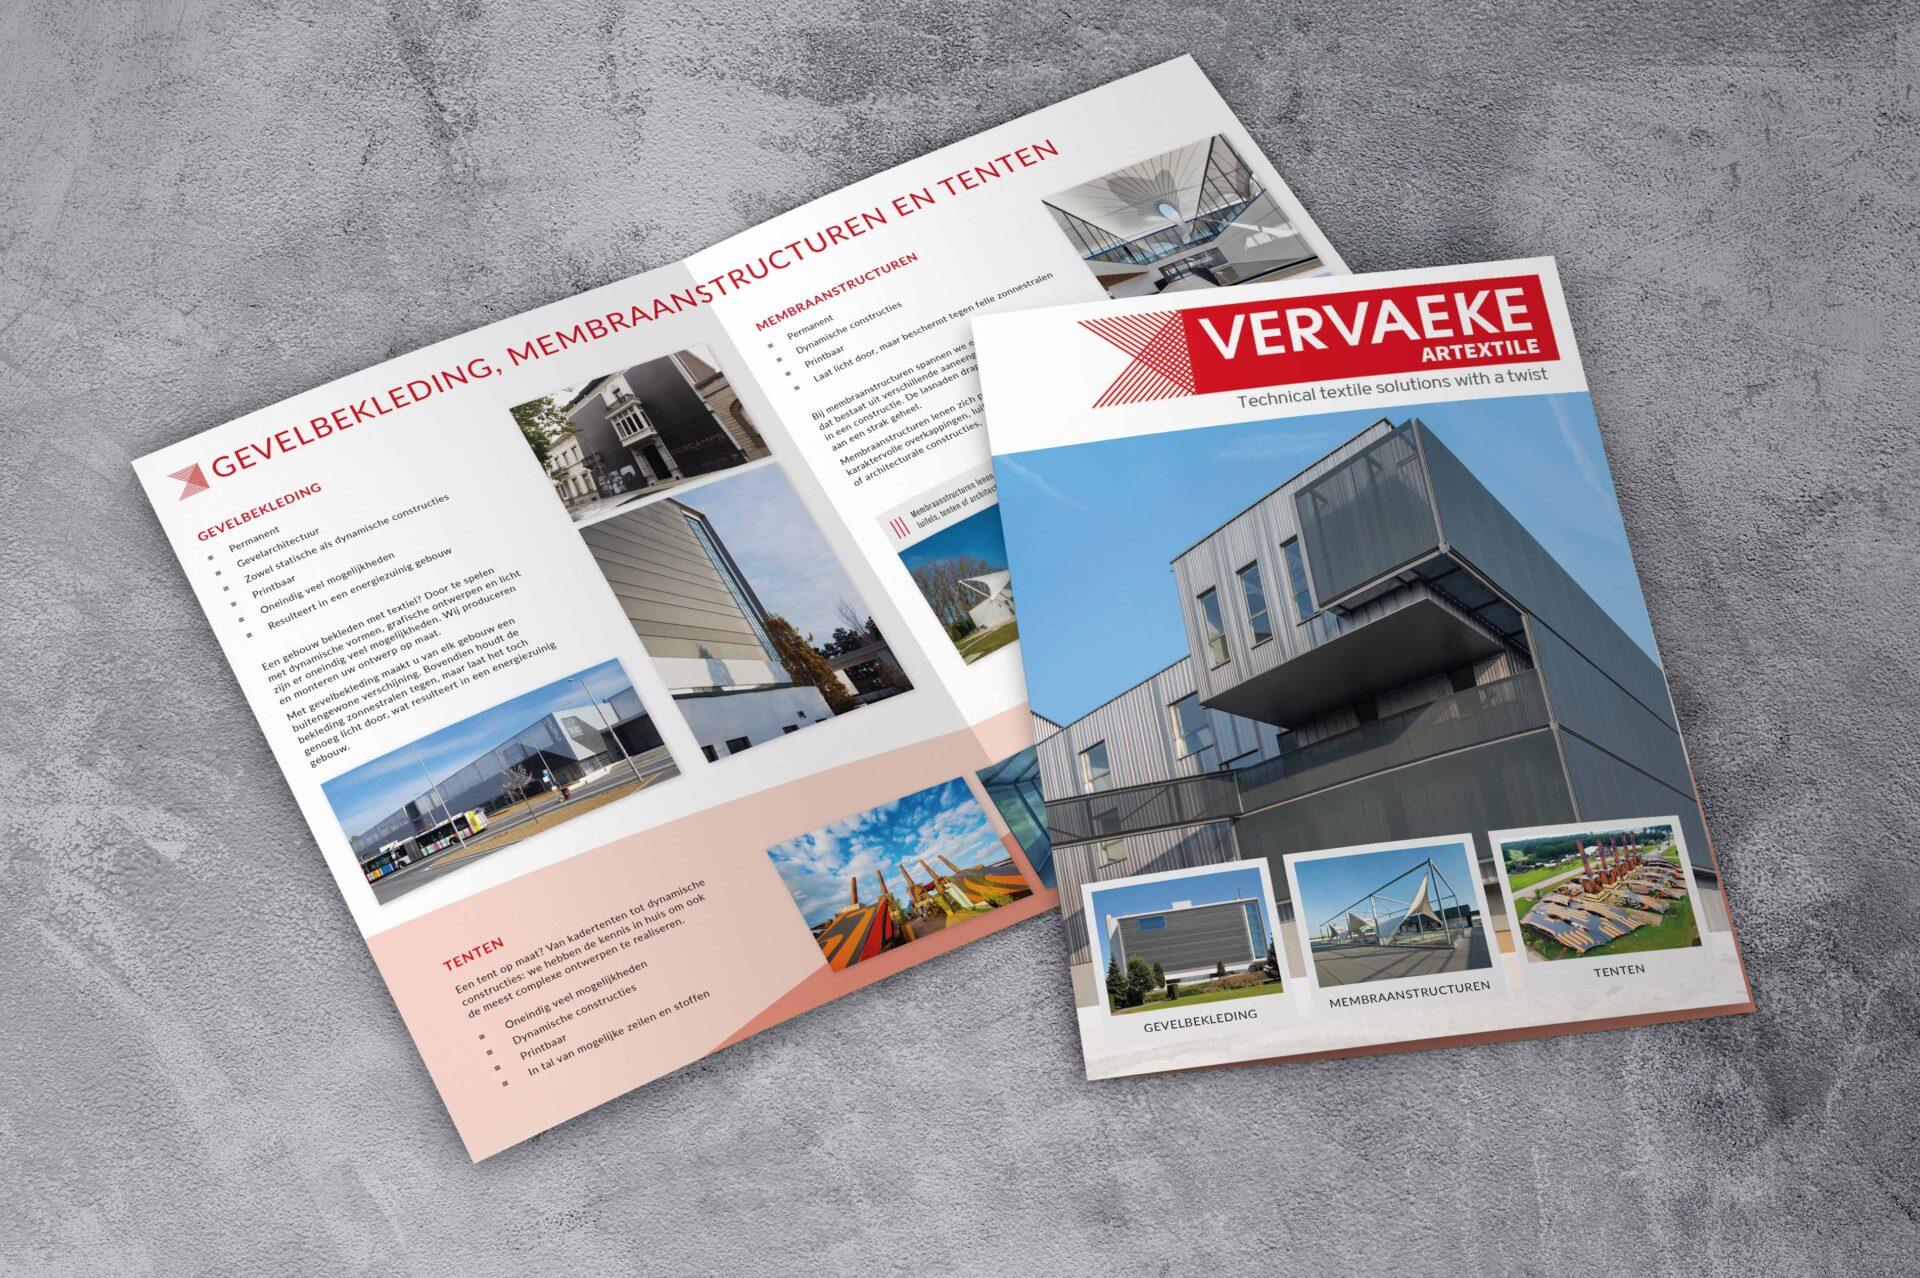 Vervaeke brochure